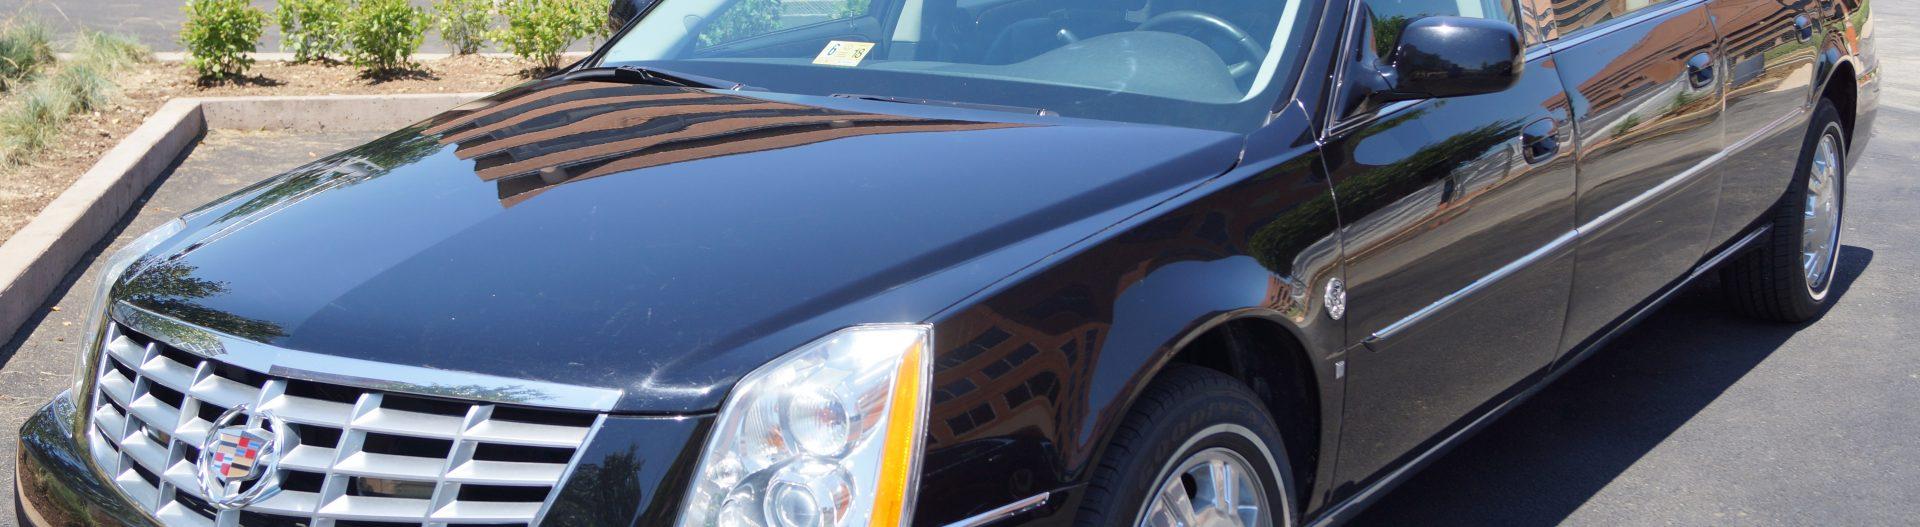 2010 Cadillac DTS Limo